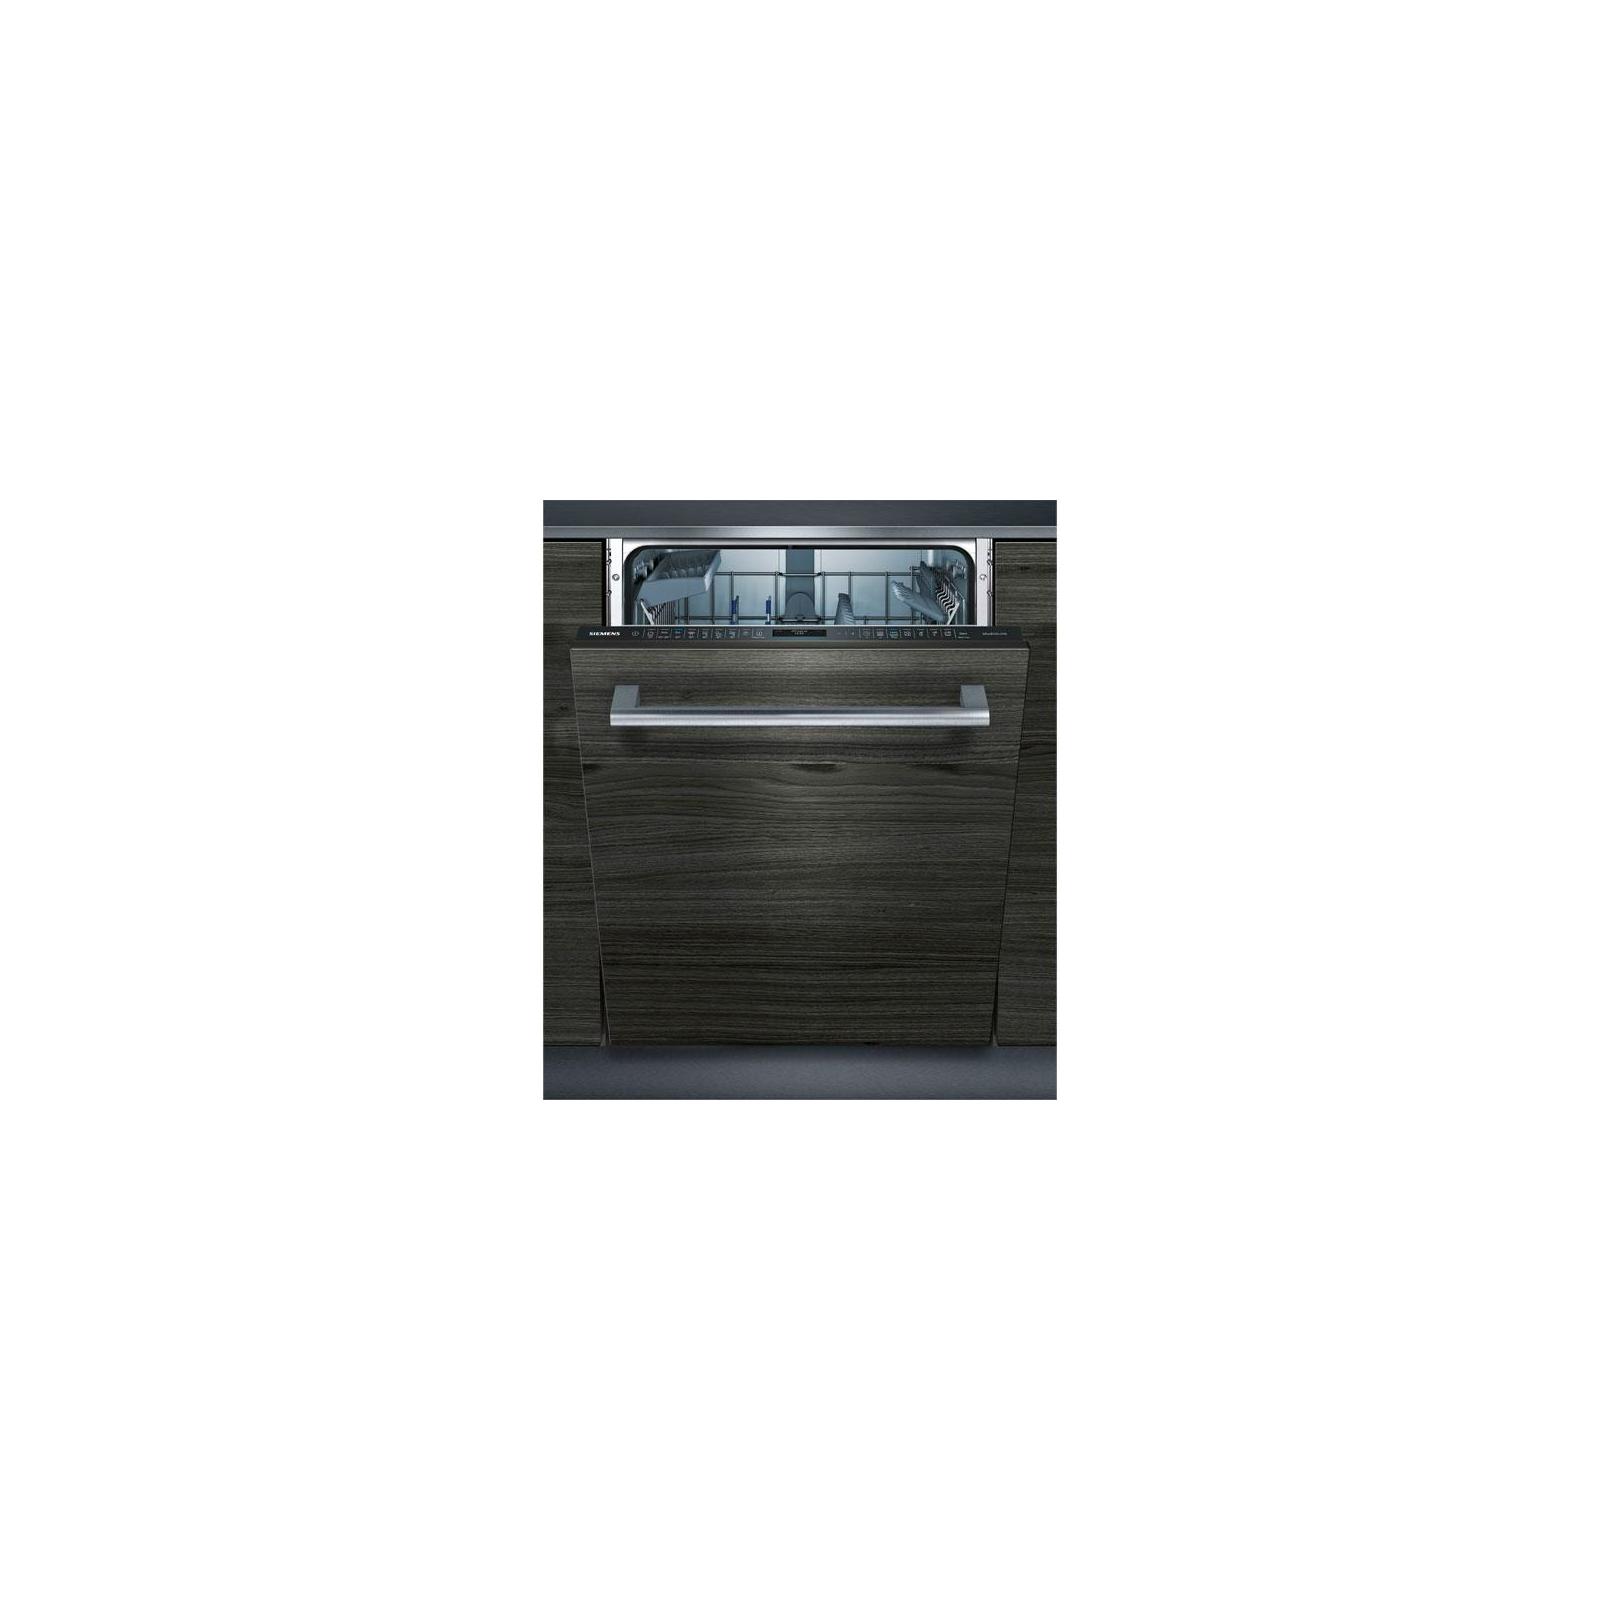 Посудомоечная машина Siemens SX 857 X00PE